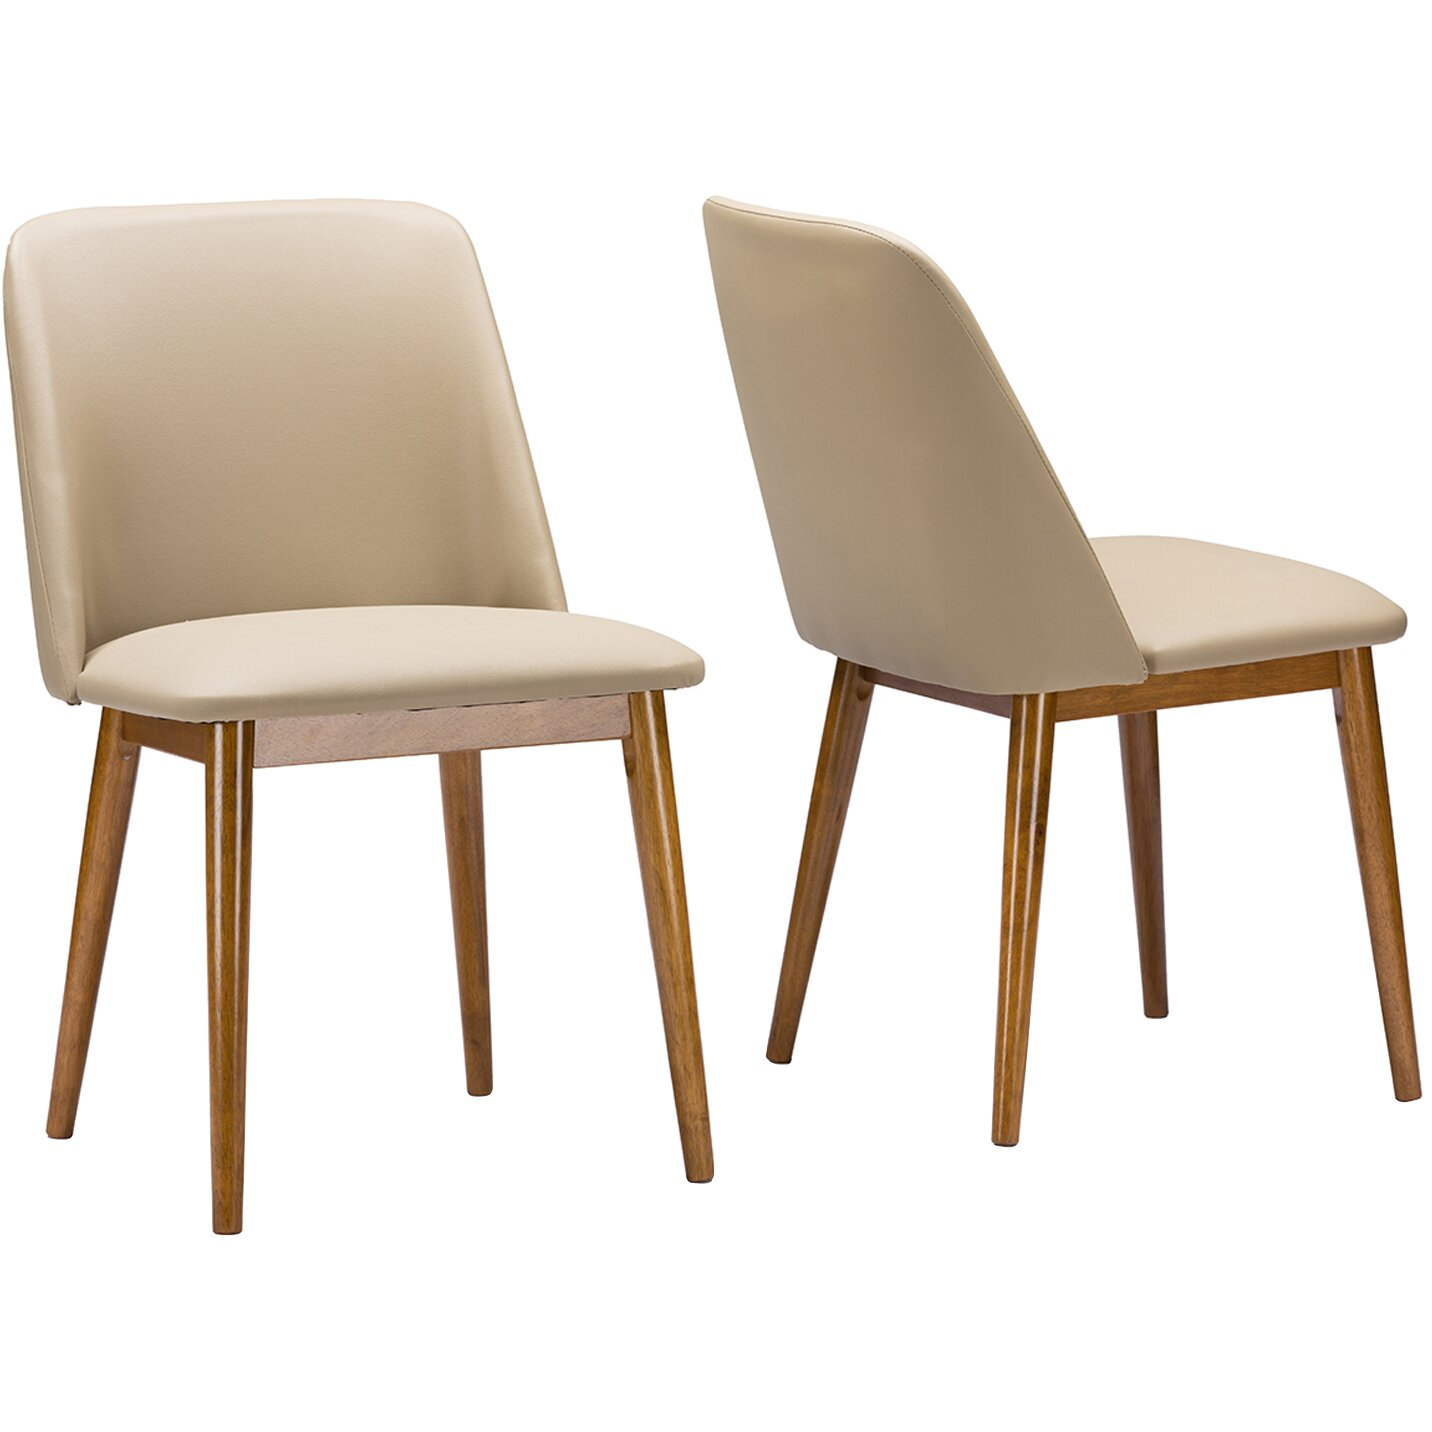 Wholesale Interiors Baxton Studio Lavin Side Chair